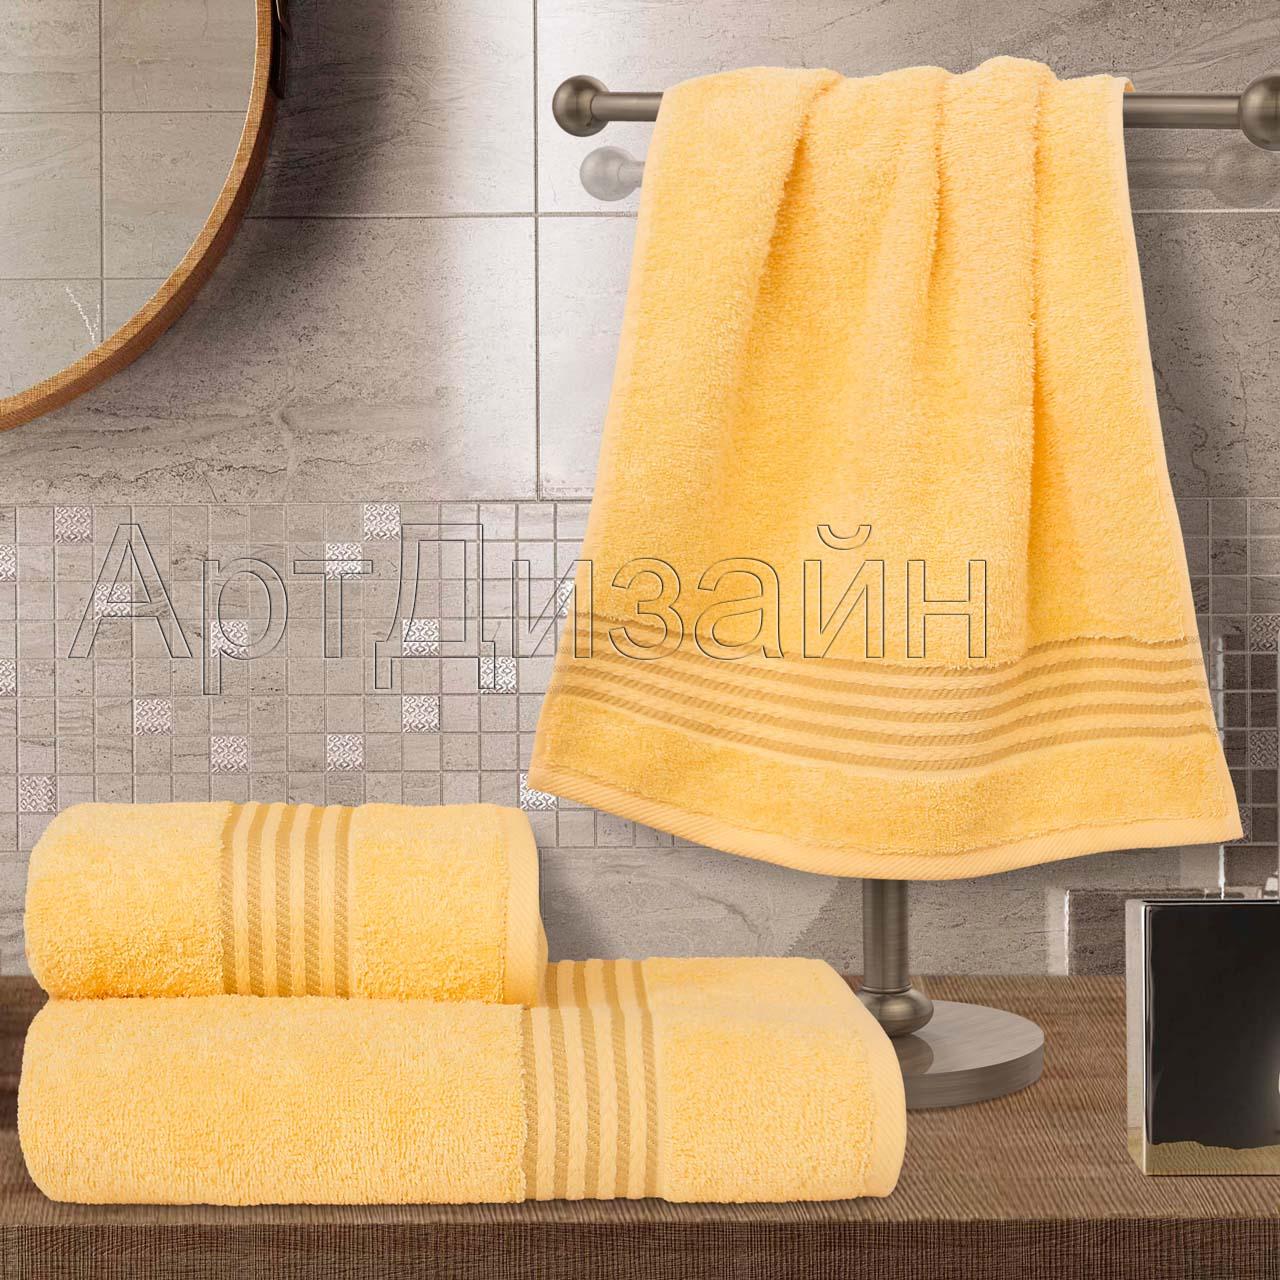 Полотенце Классик Светло-желтый р. 40х70Махровые полотенца<br>Плотность:400 г/кв. м<br><br>Тип: Полотенце<br>Размер: 40х70<br>Материал: Махра